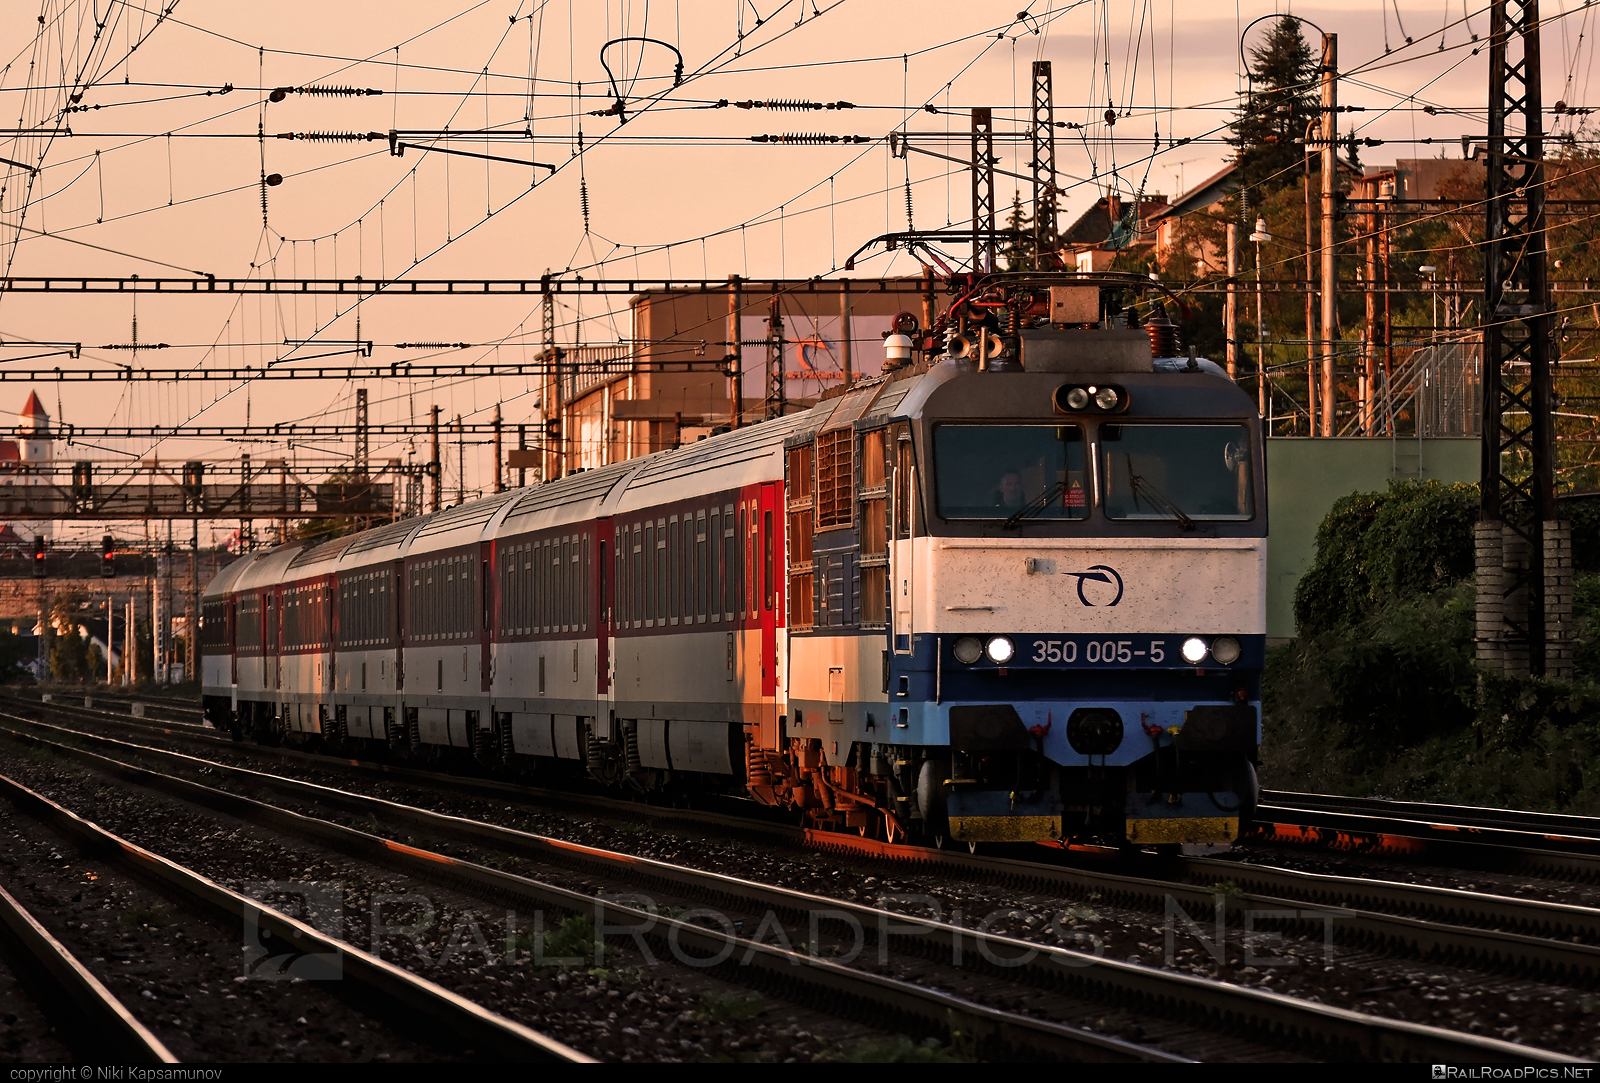 Škoda 55E - 350 005-5 operated by Železničná Spoločnost' Slovensko, a.s. #ZeleznicnaSpolocnostSlovensko #gorila #locomotive350 #skoda #skoda55e #zssk